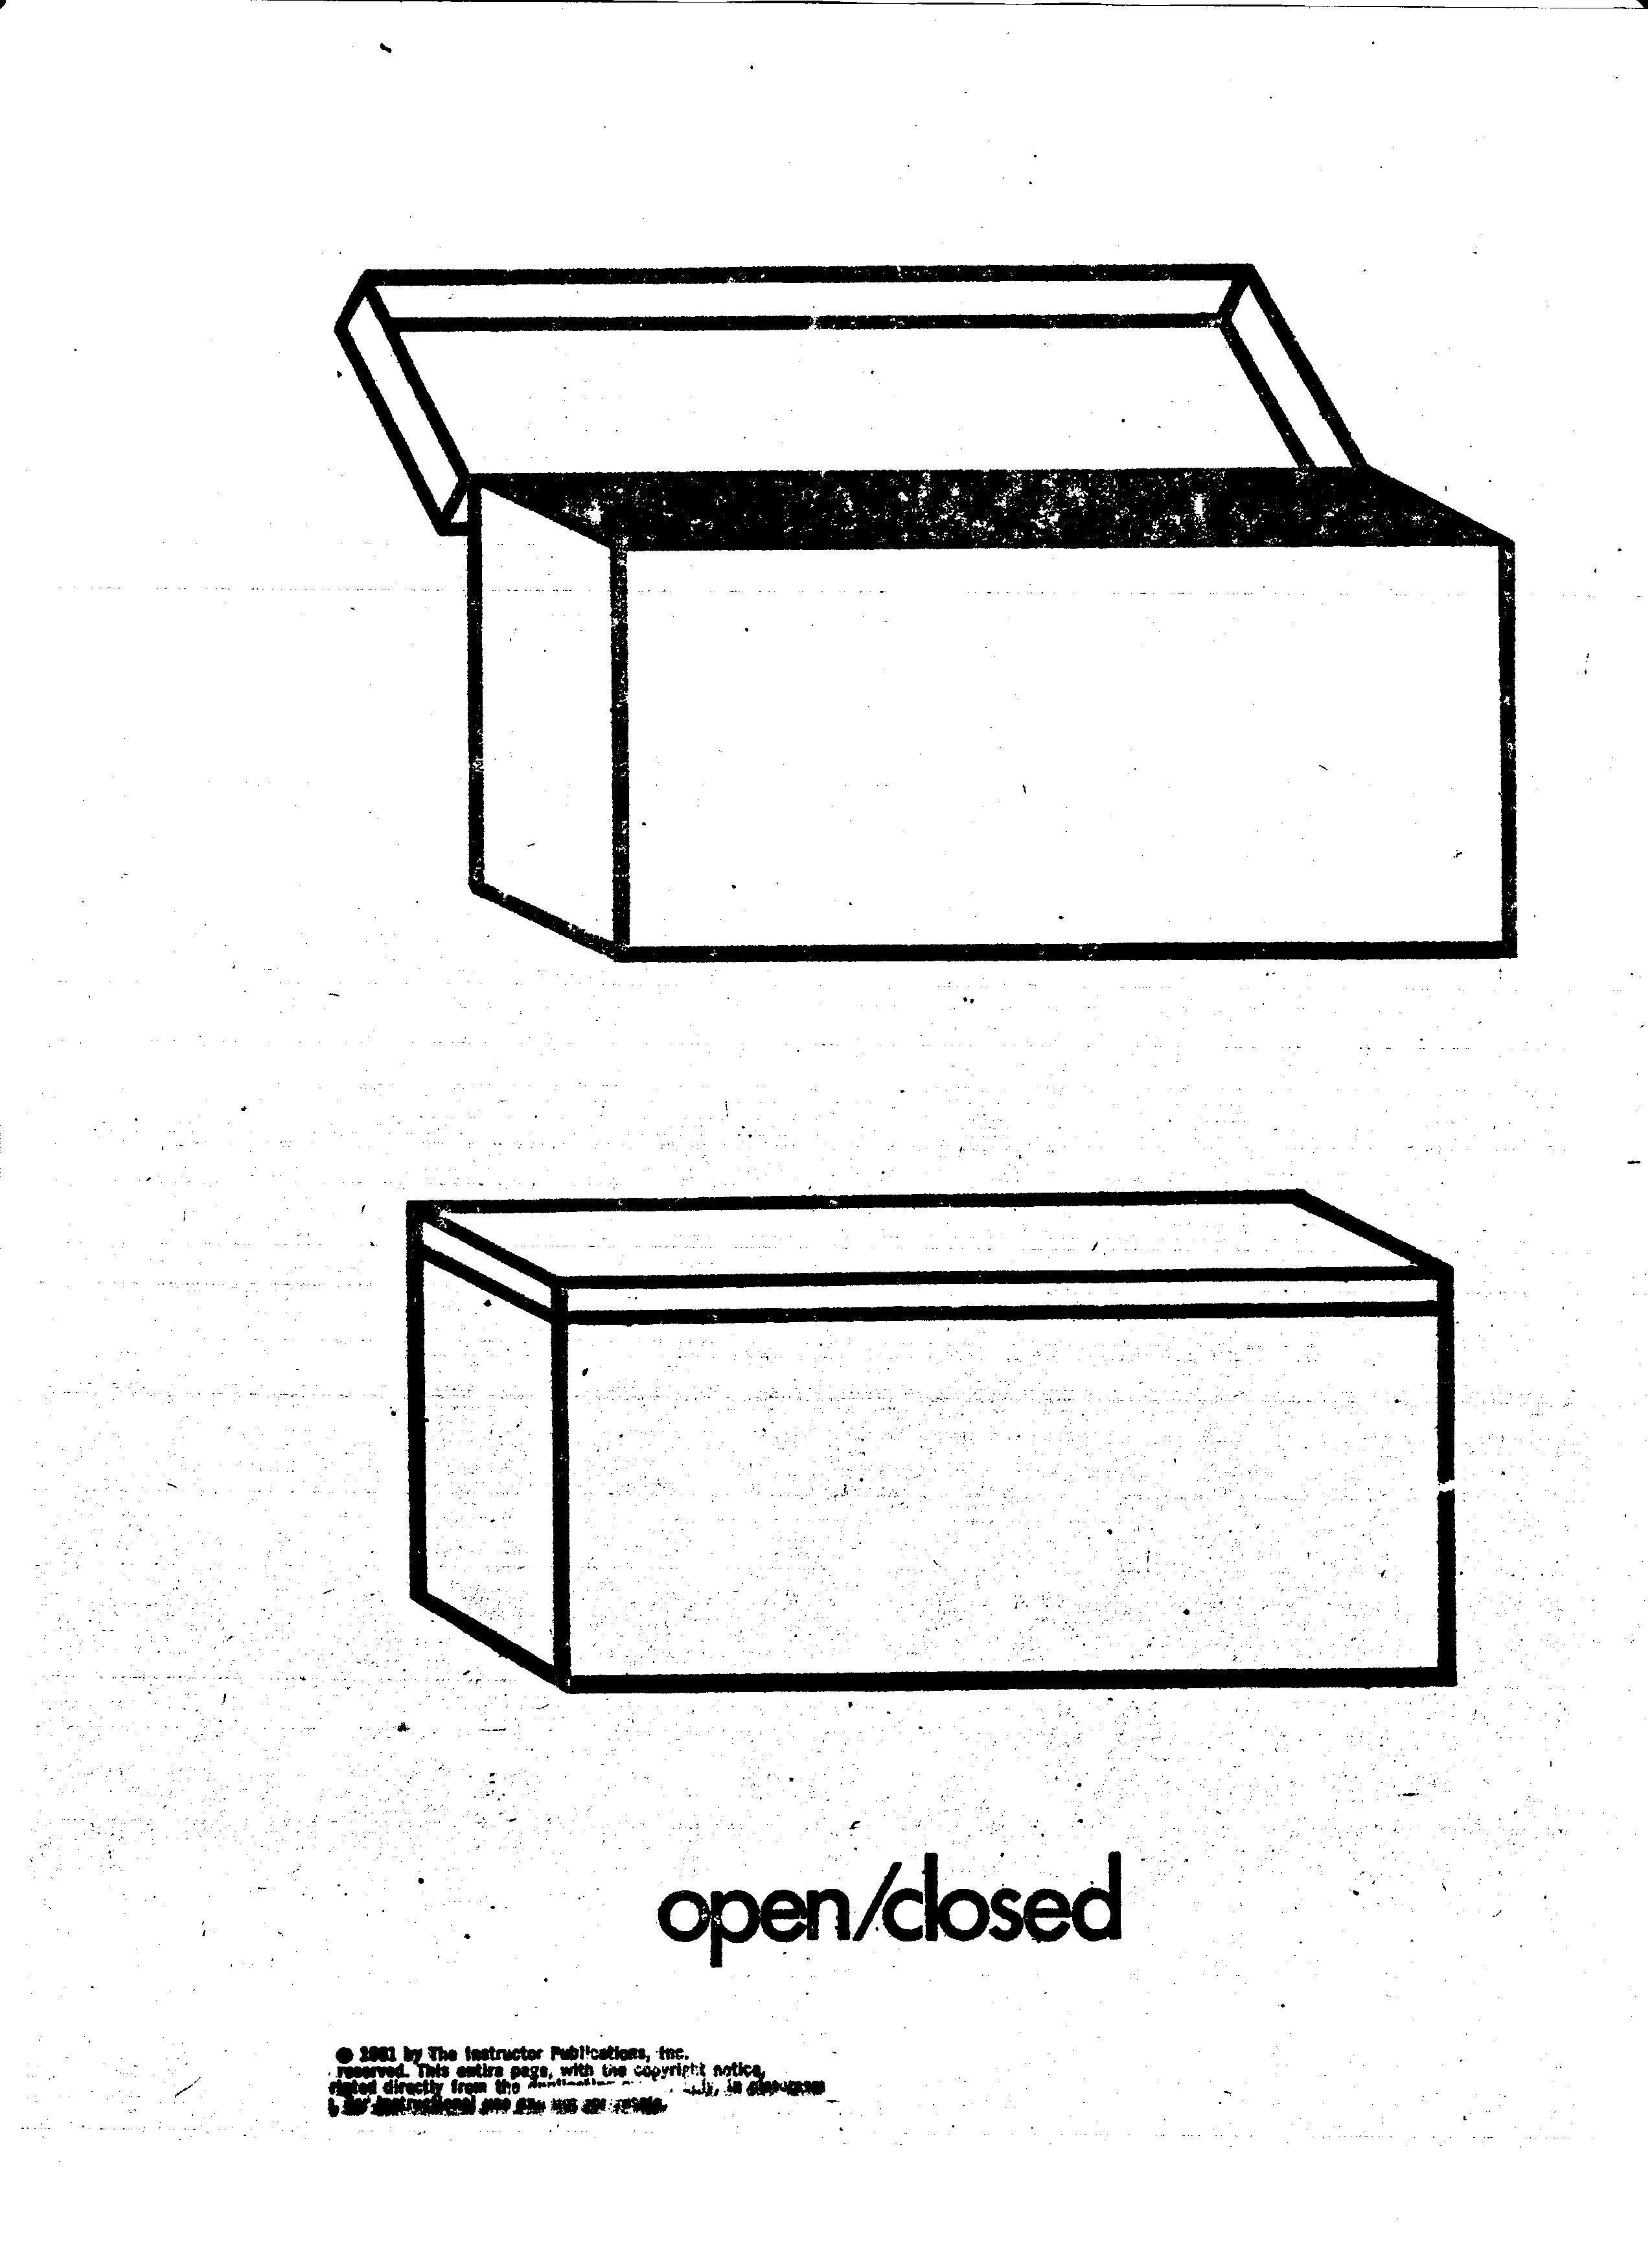 Opposite Open Closed